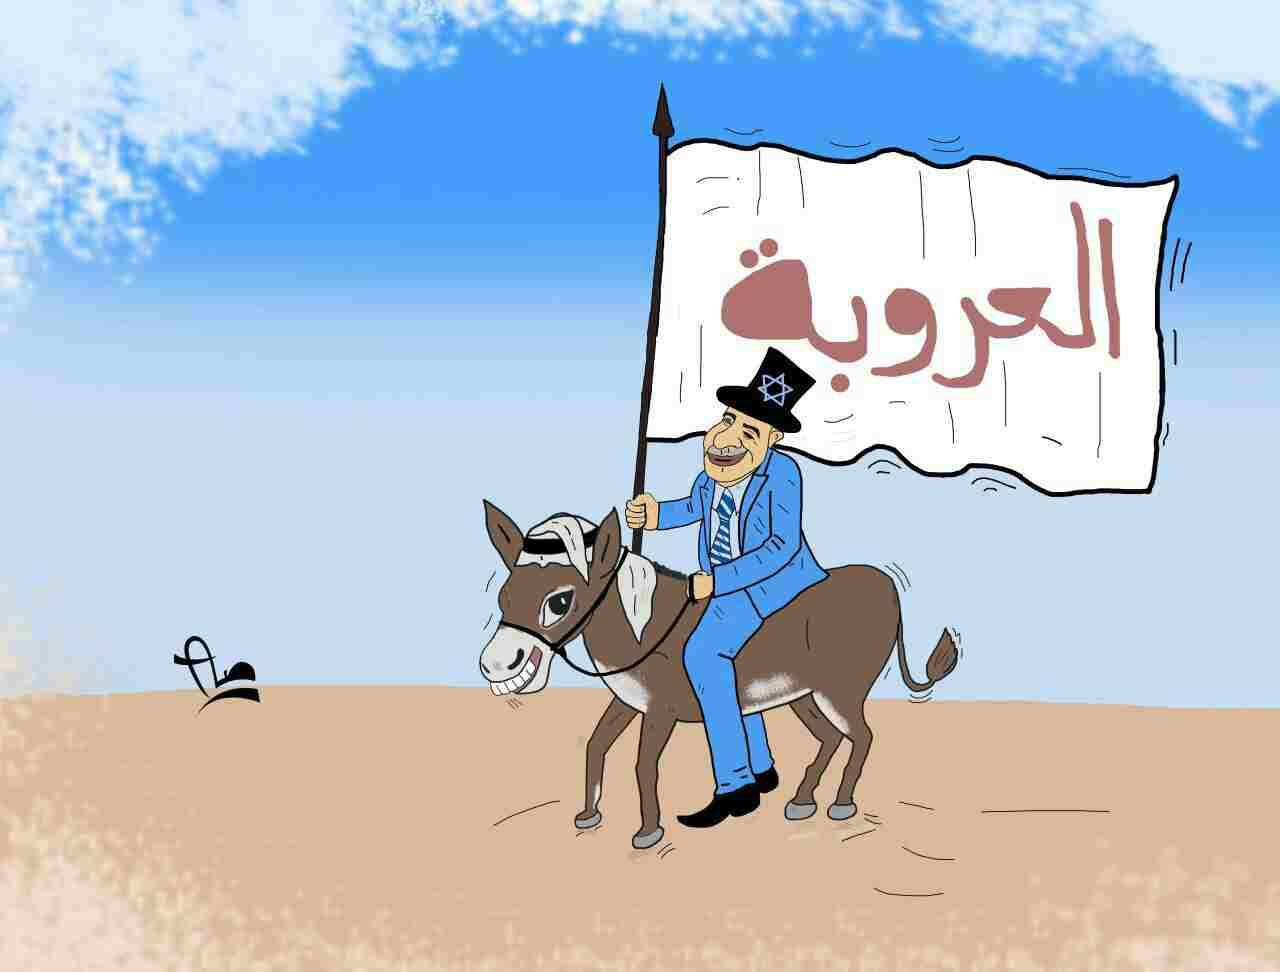 Photo of كاريكاتير يشرح حالة العروبة والعرب في ظل الهيمنة الأمريكية